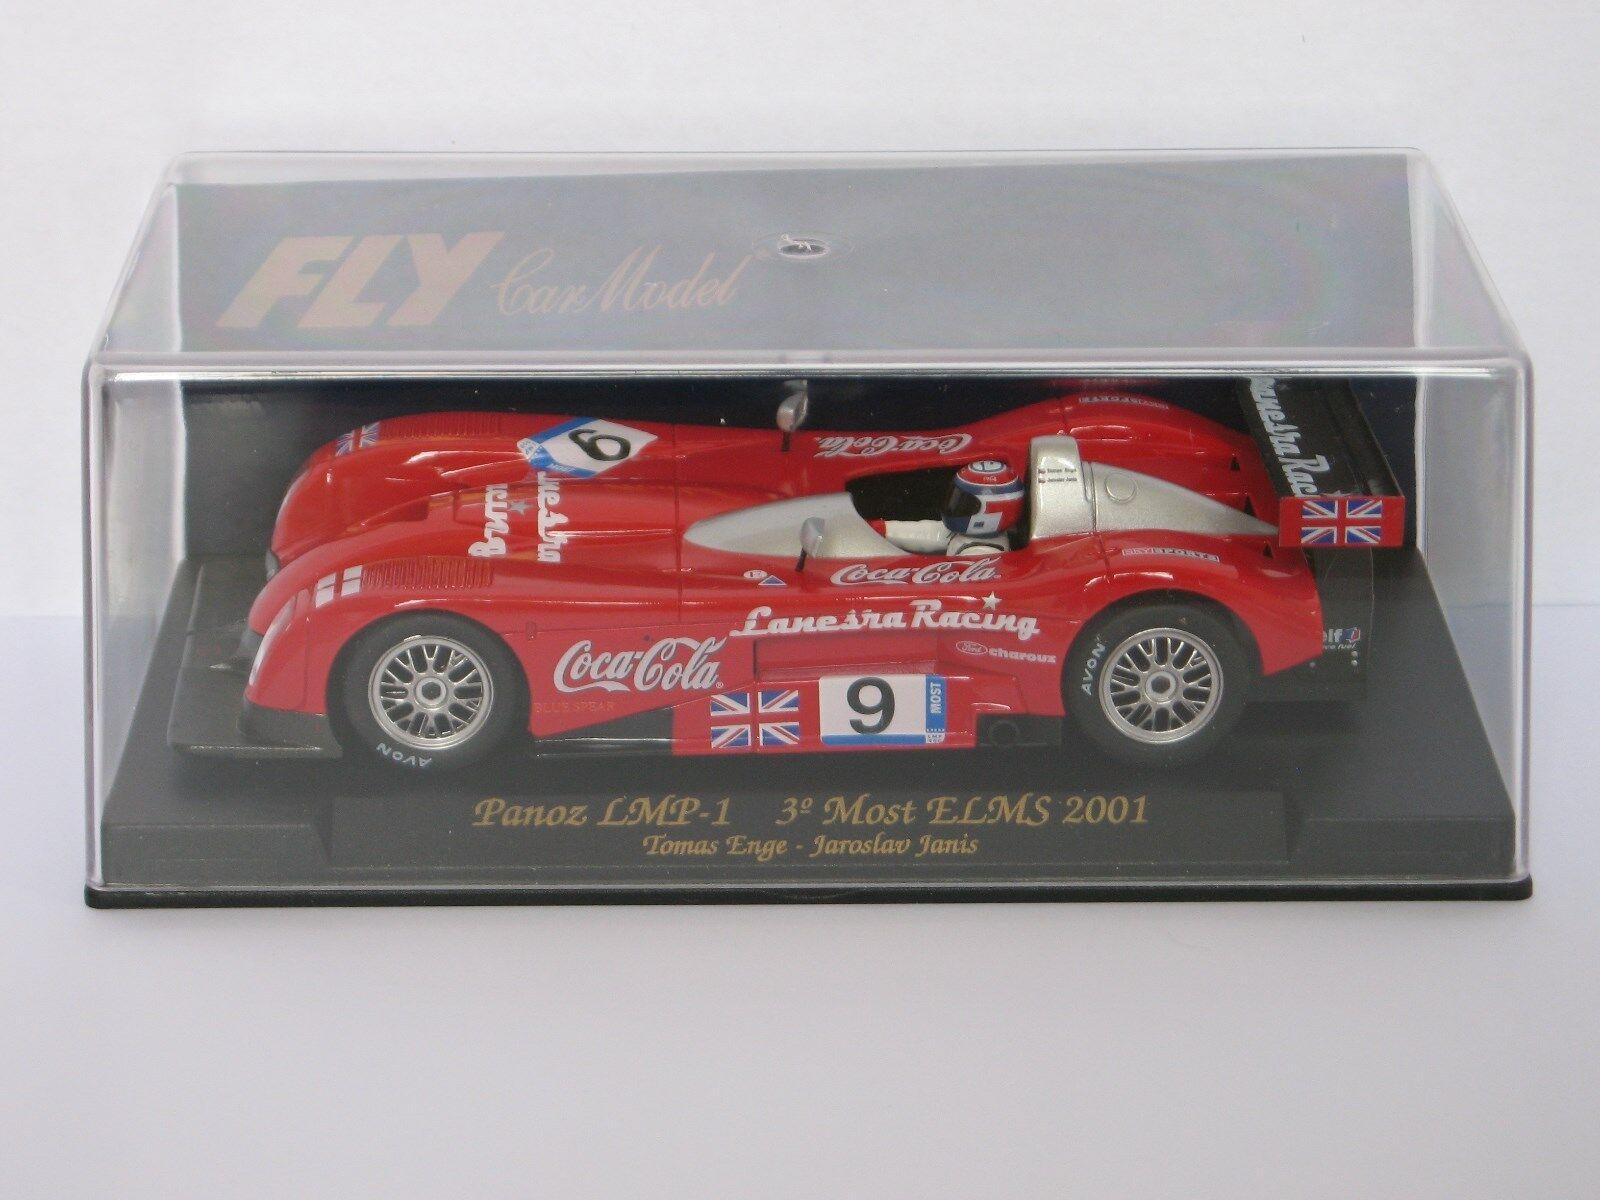 FLY Car Panoz LMP-1 3° Most ELMS 2001 Roadster Coca-Cola - Ref. A221